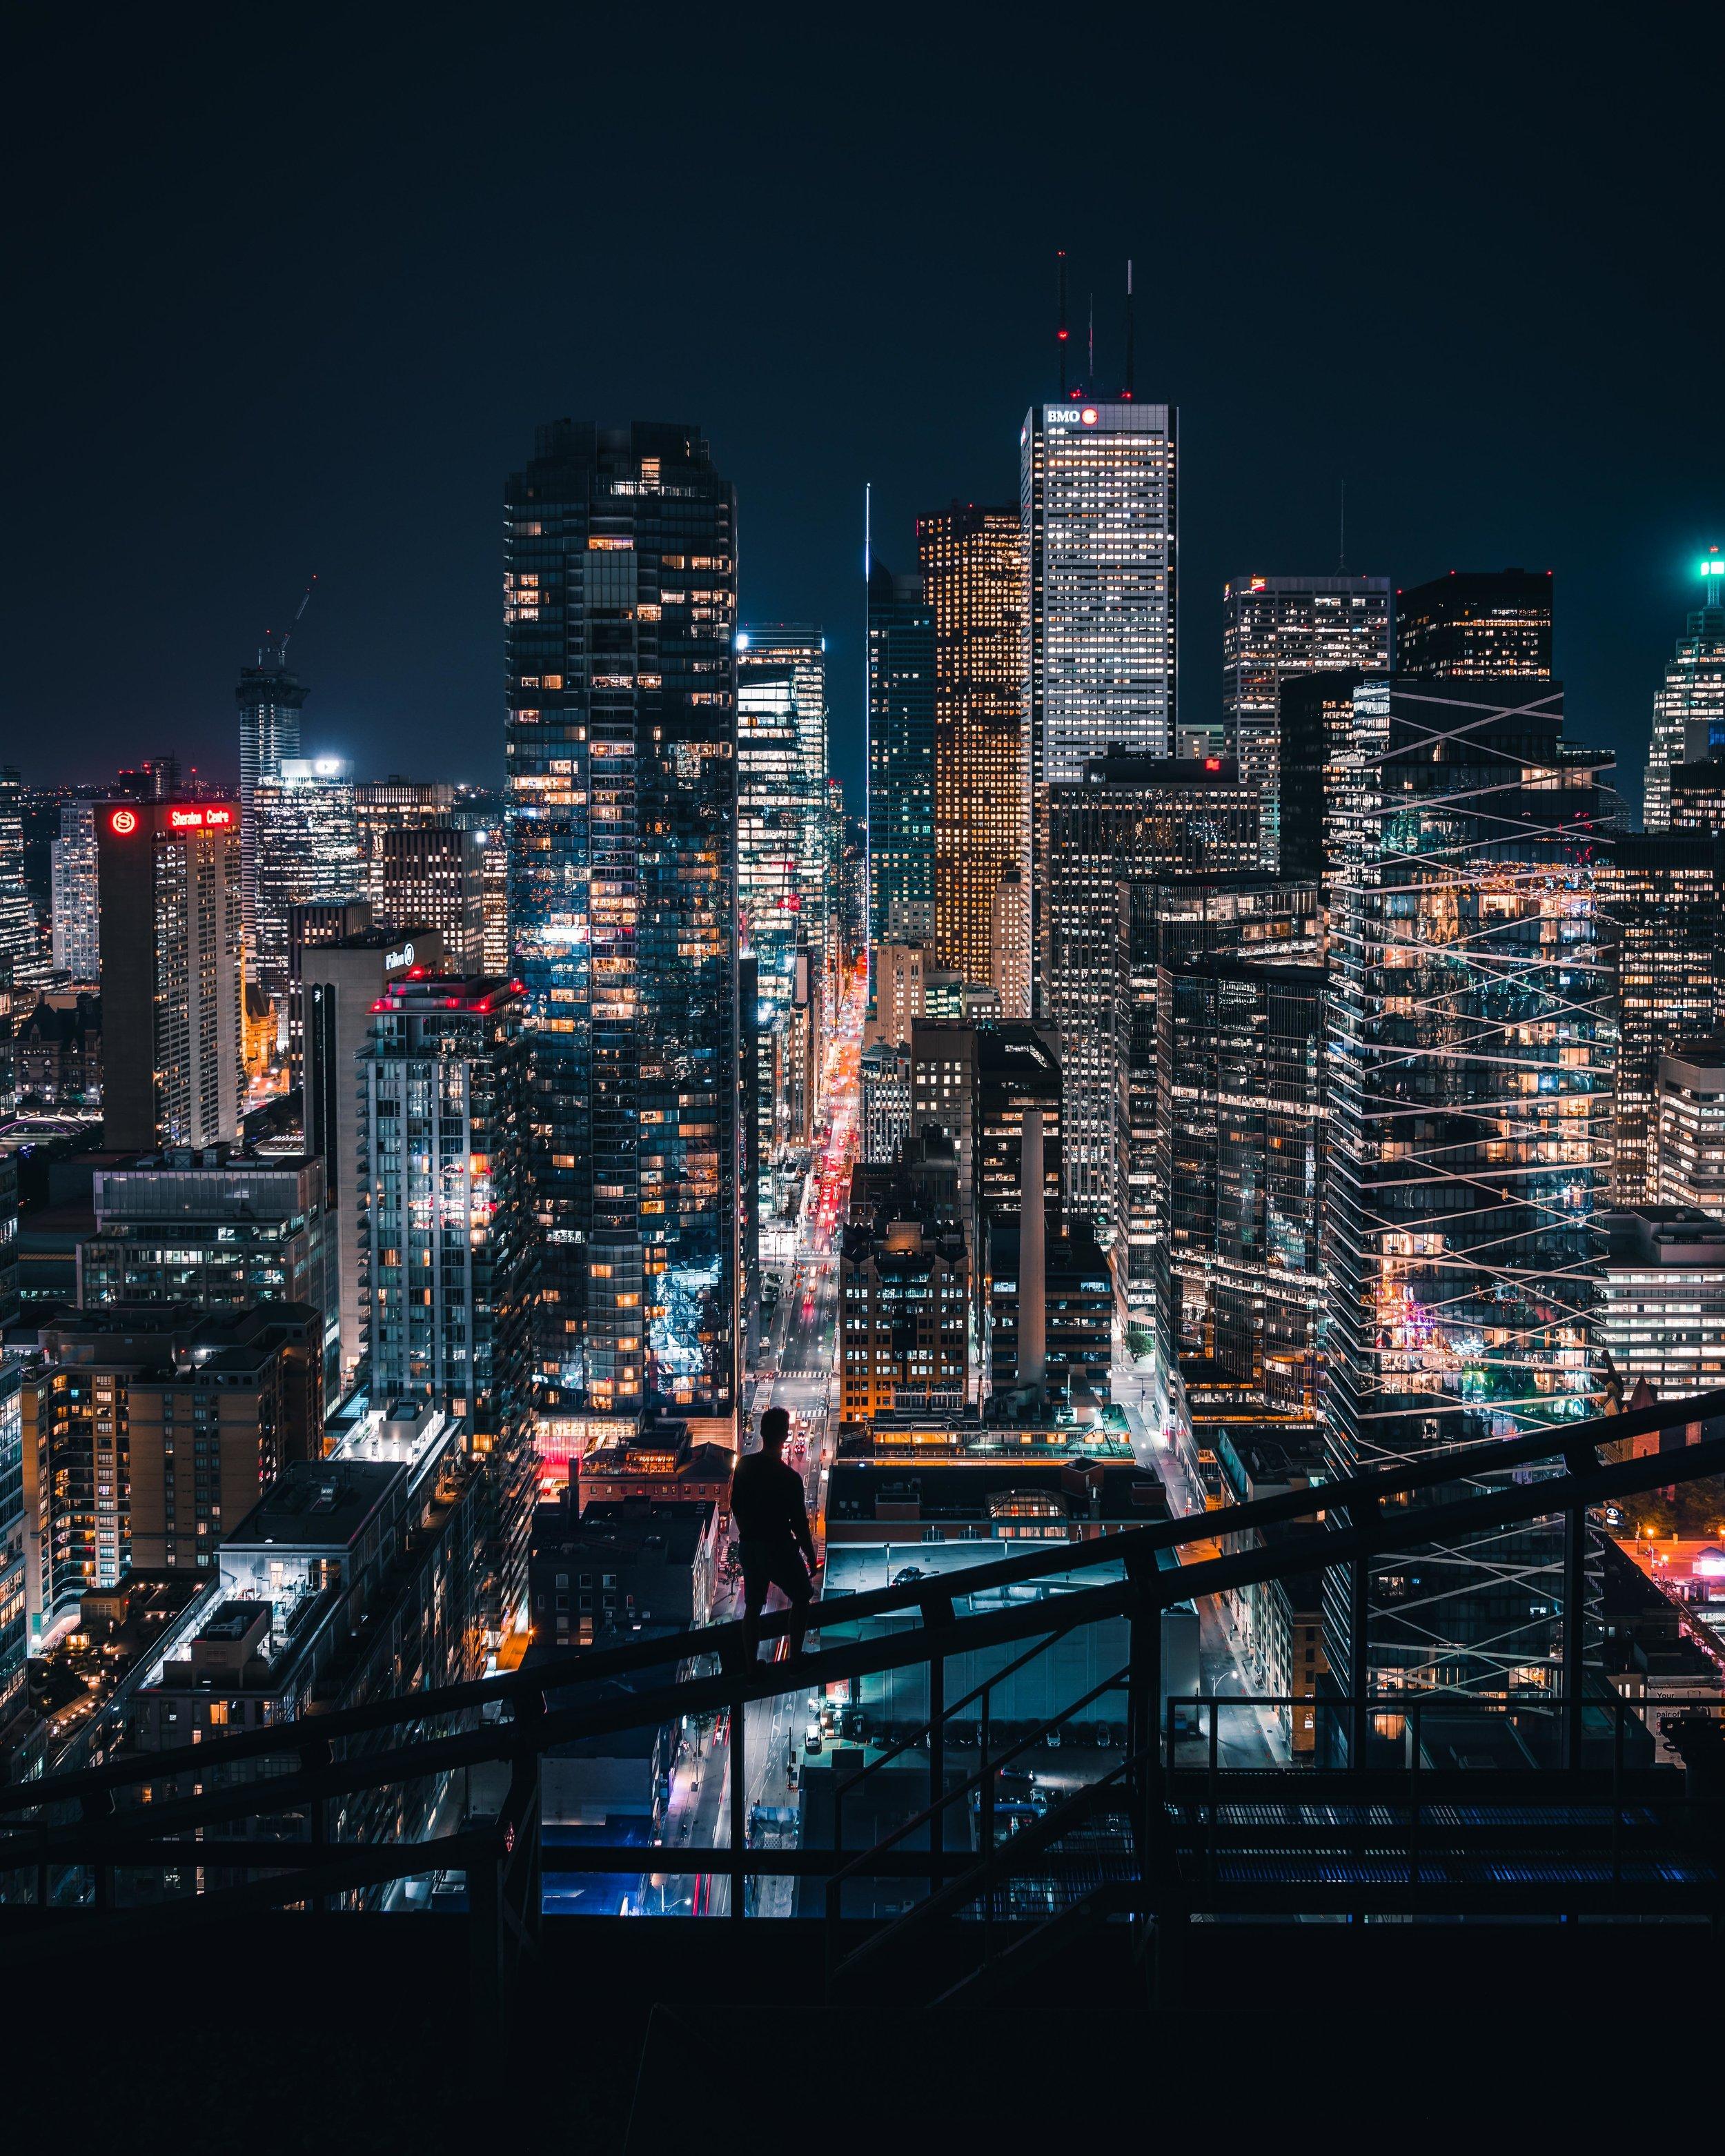 city-skyline-at-night-urban-exploration